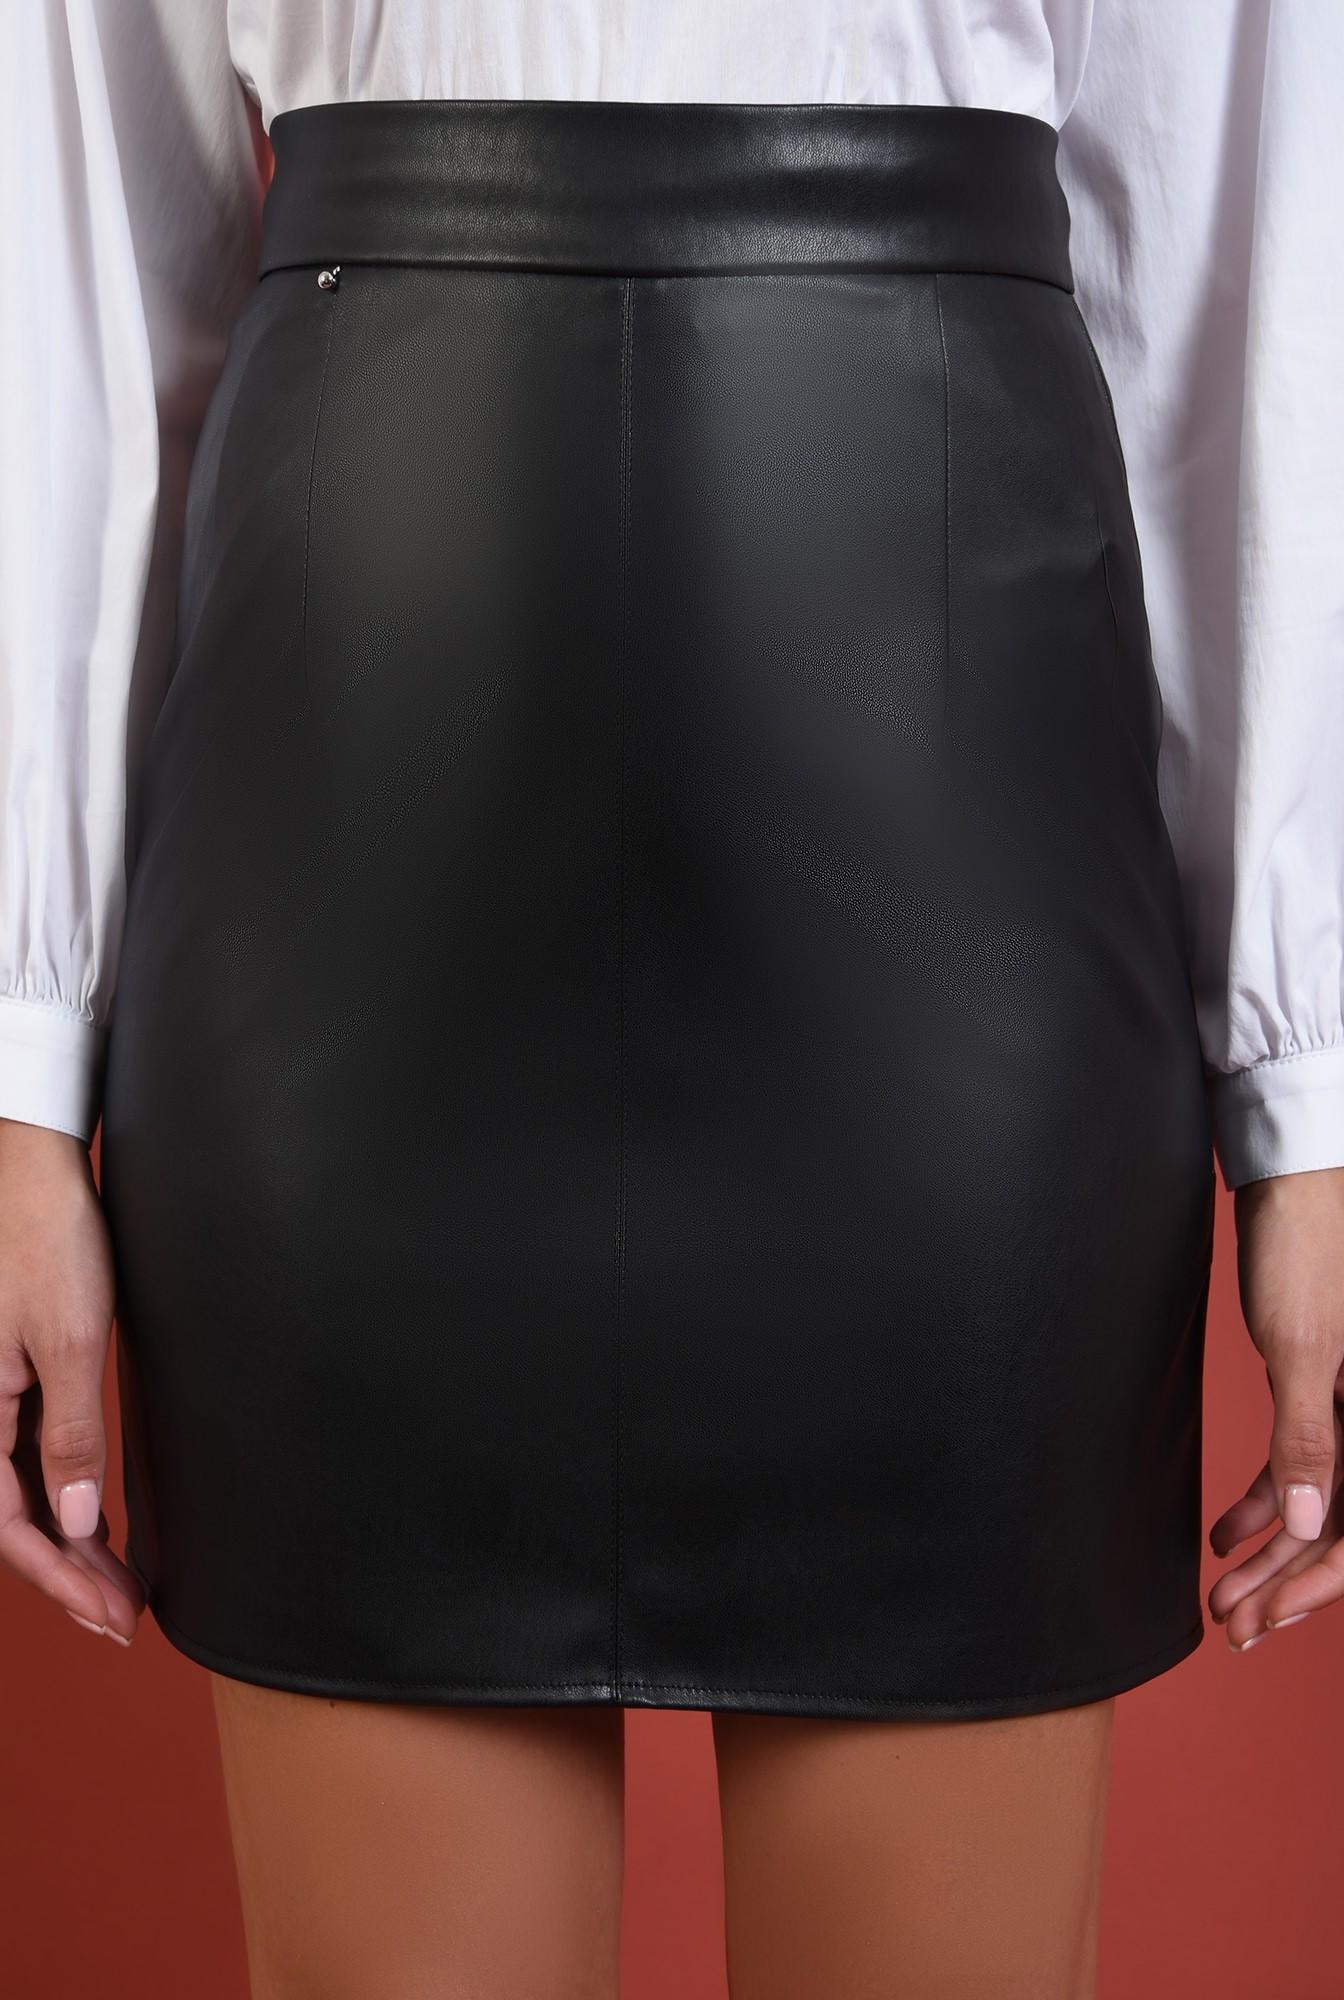 2 - fusta neagra, scurta, Poema, cu talie inalta, betelie, piele eco, Poema